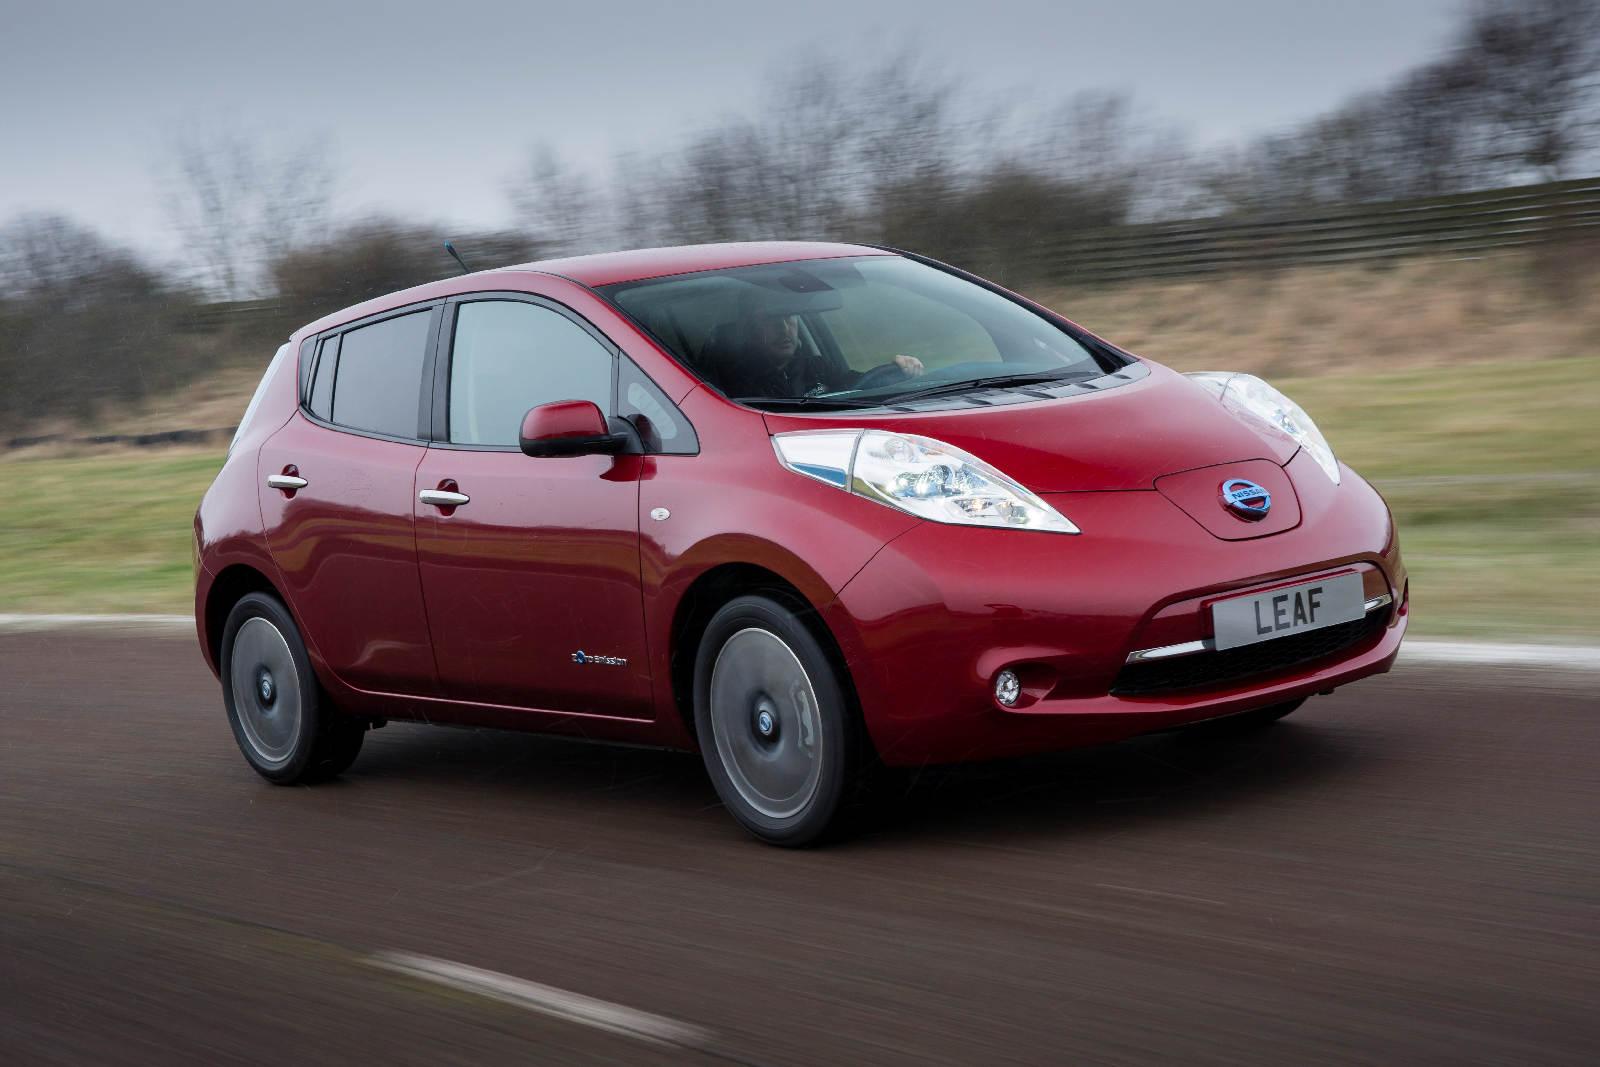 Nissan_Leaf_2013_8